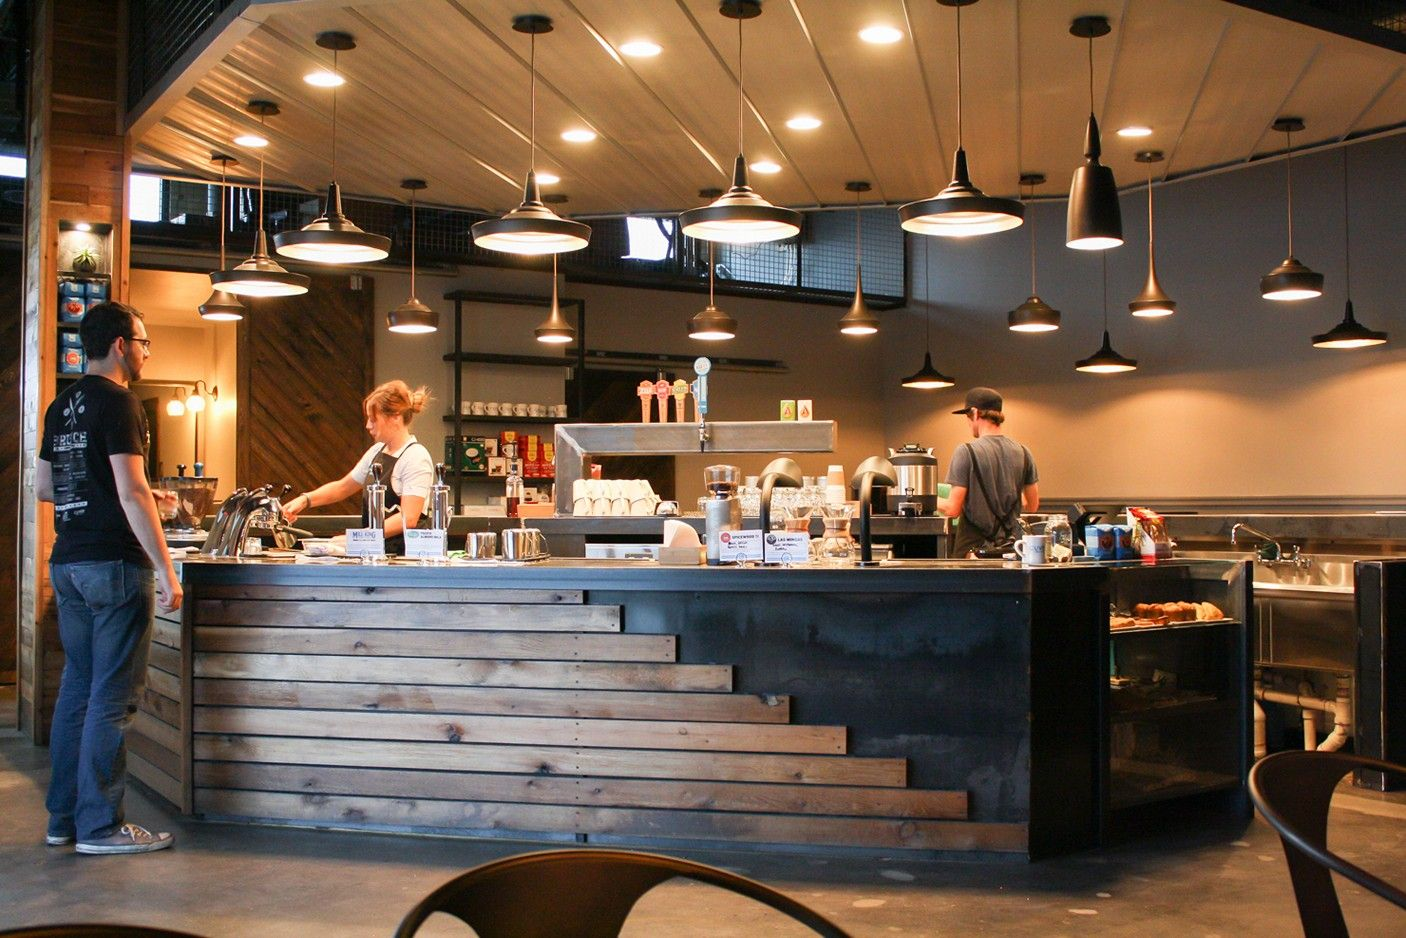 20 Handy Coffee Bar Ideas for Your Home | Pinterest | Bar, Coffee ...